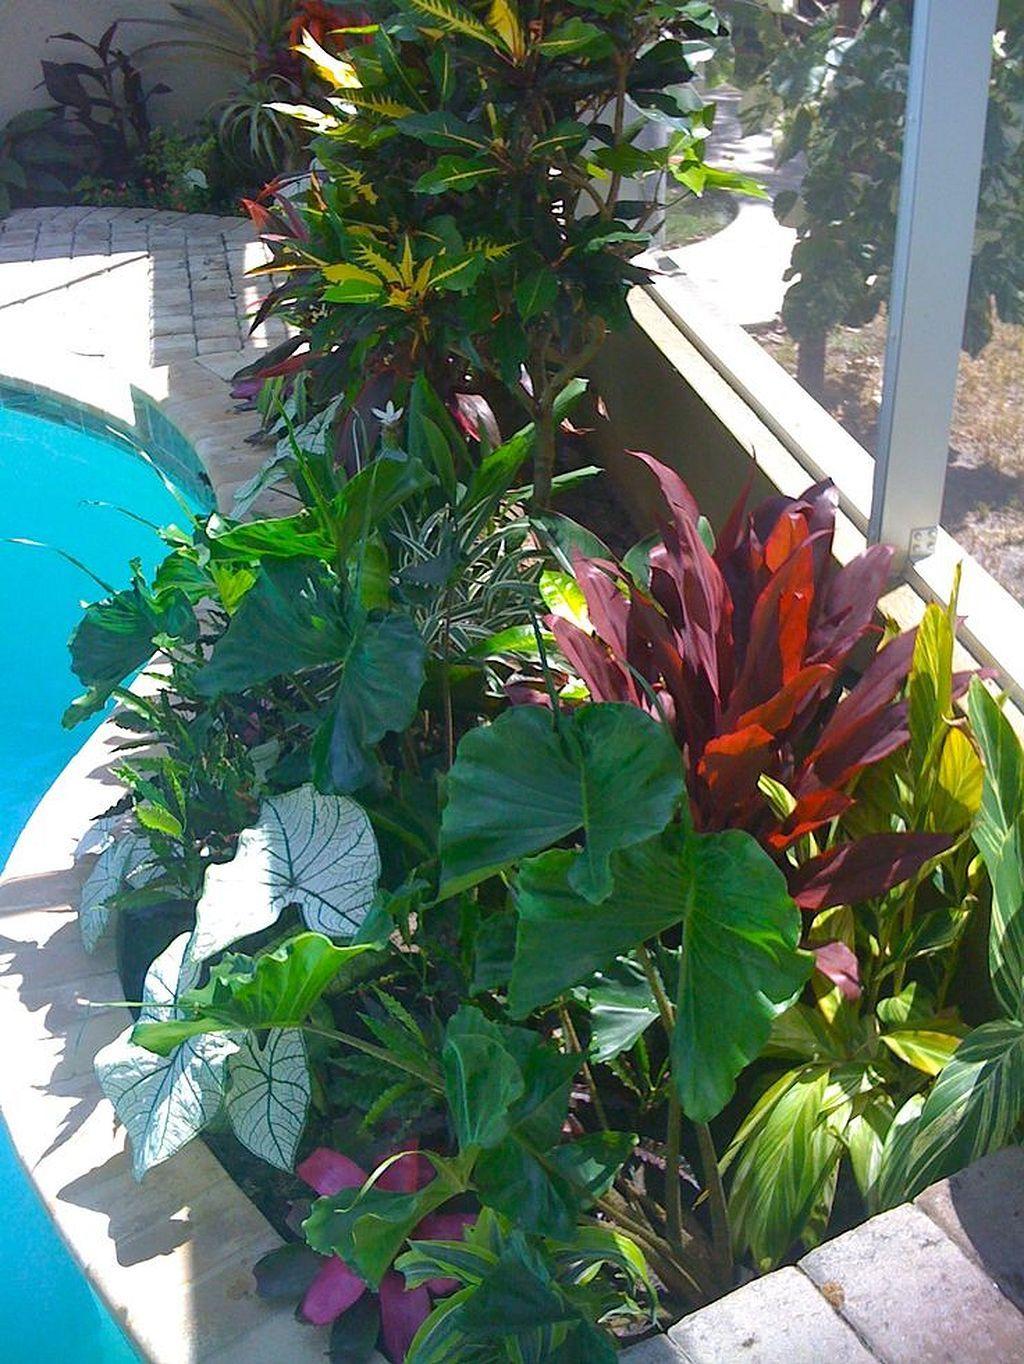 The Ultimate Revelation Of Tropical Landscaping 57 #tropischelandschaftsgestaltung